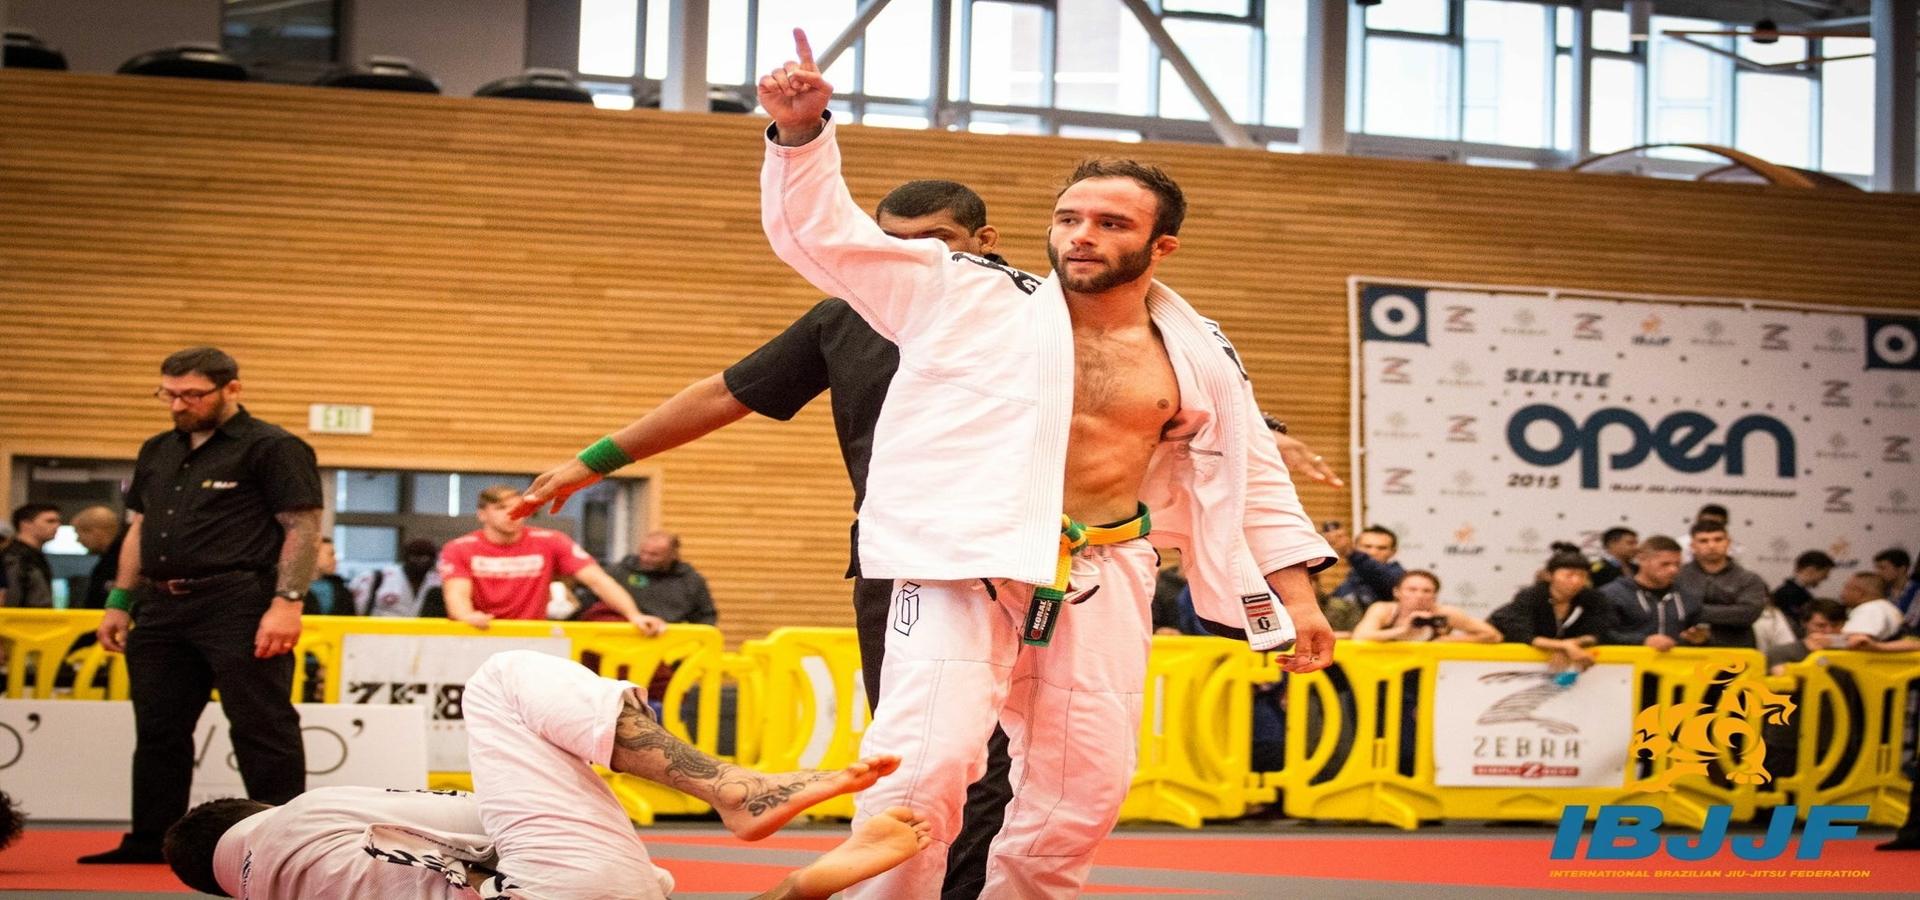 Home of Ares Brazilian Jiu Jitsu Academy